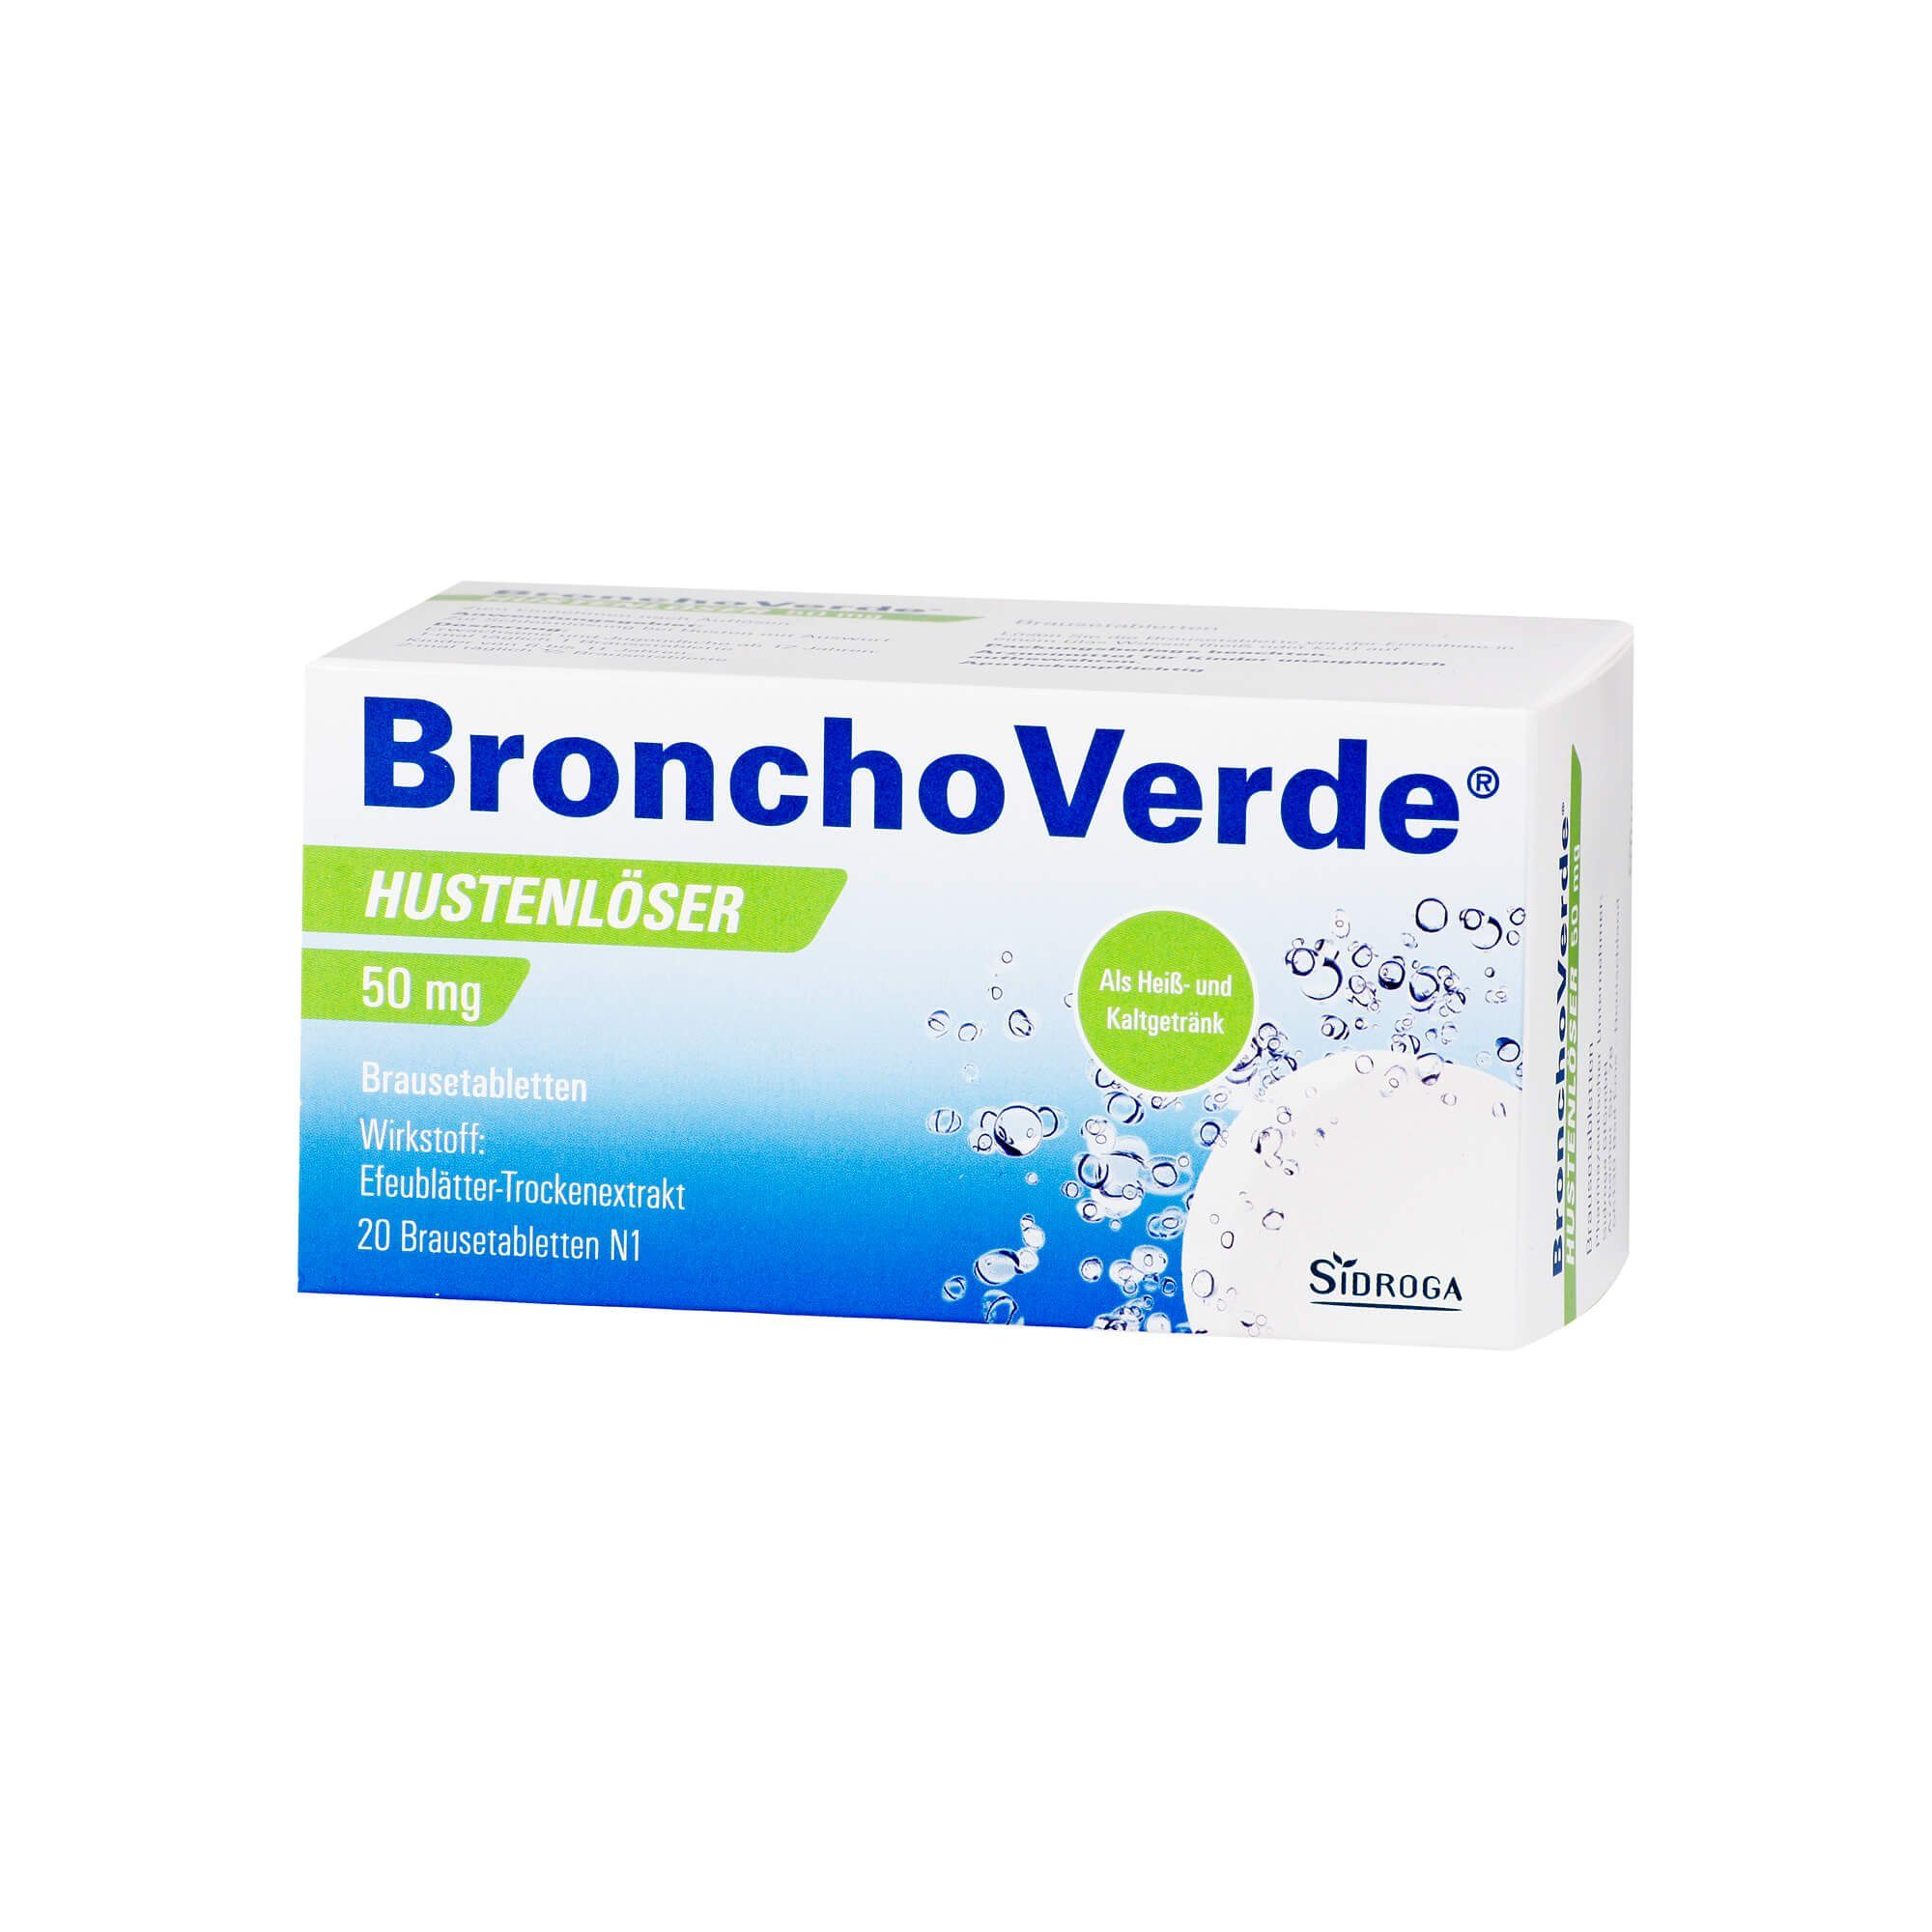 Bronchoverde BronchoVerde Hustenlöser 50 mg Brausetabletten , 20 St